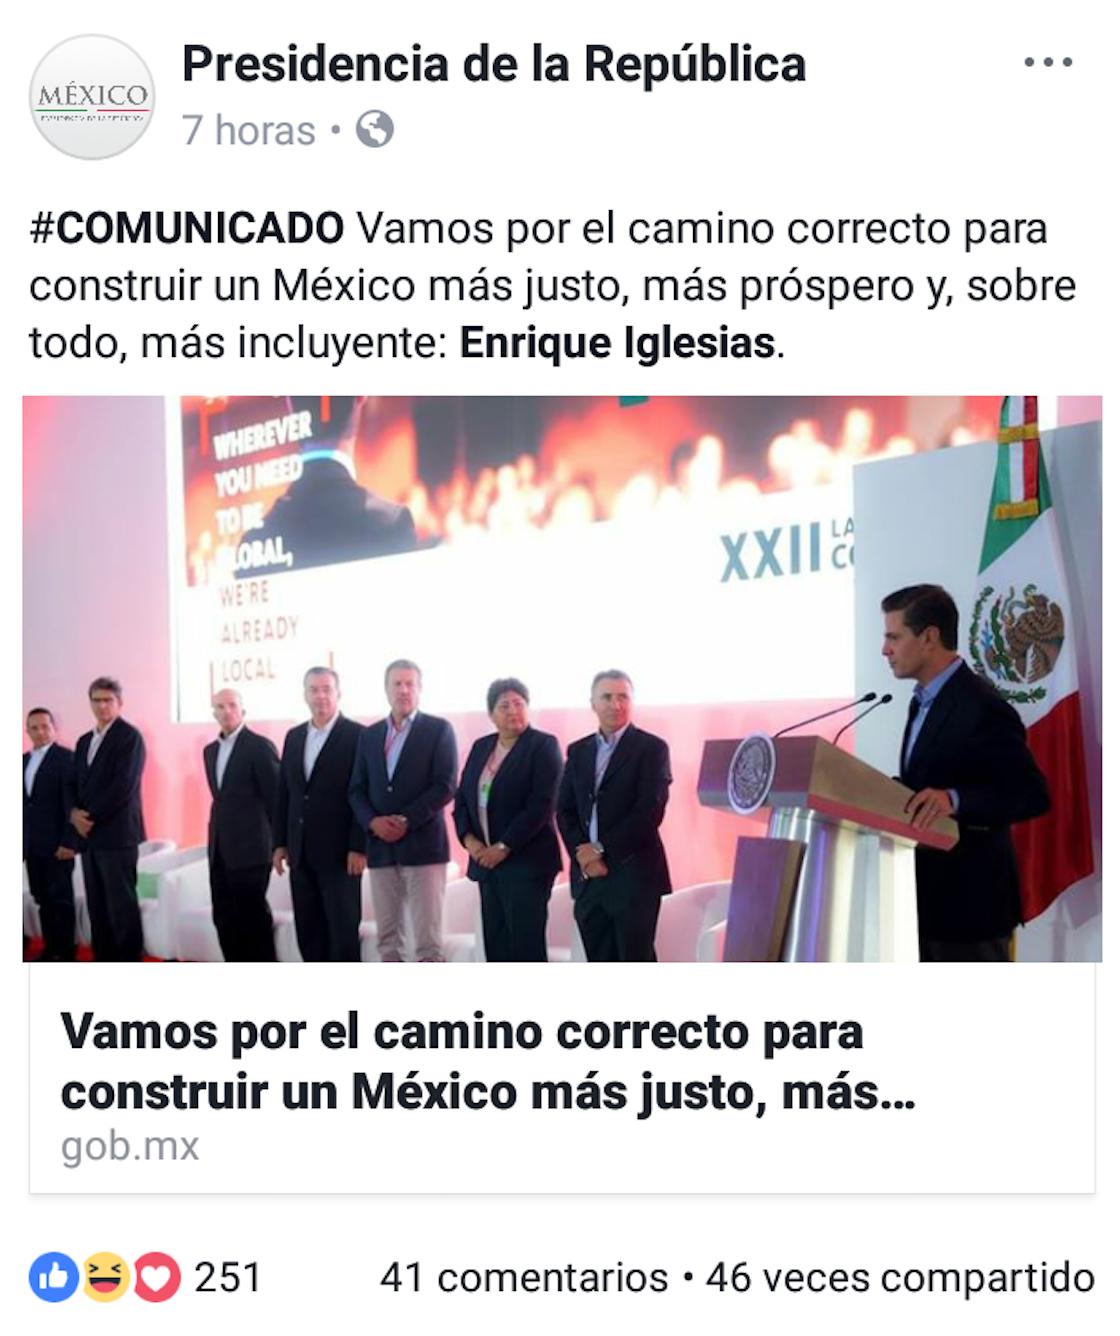 Confunden a Enrique Iglesias con Enrique Peña Nieto